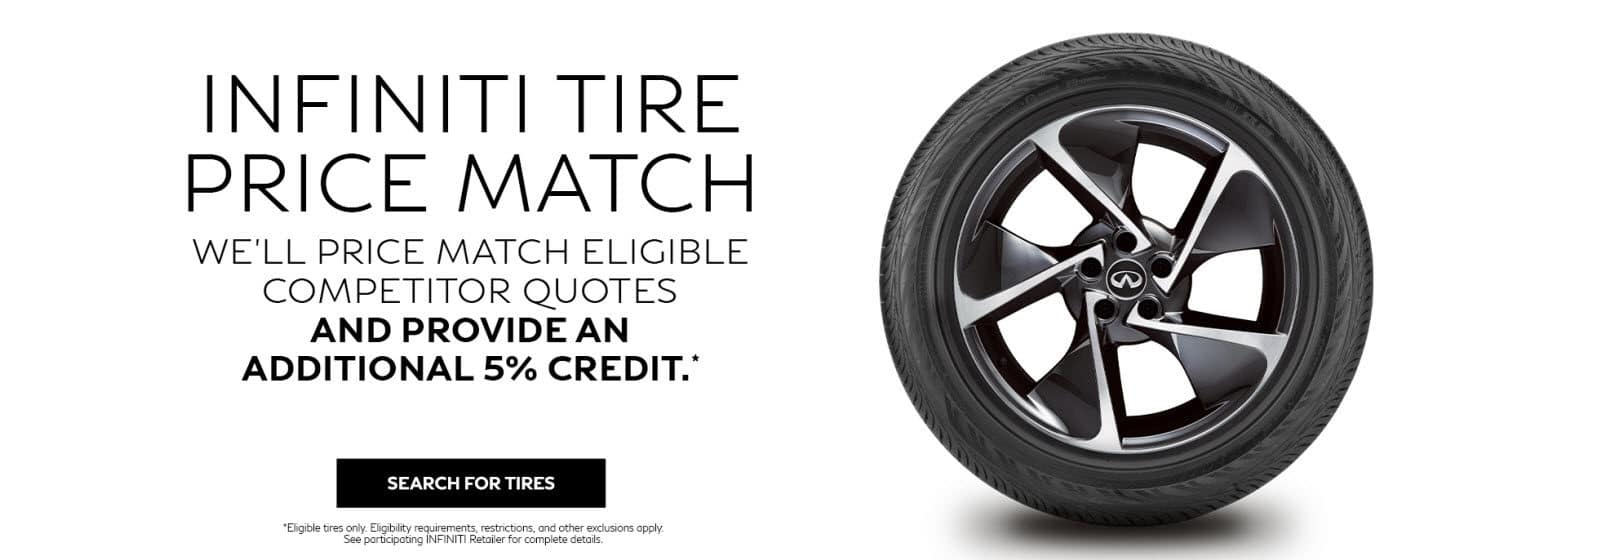 Price Match Tires